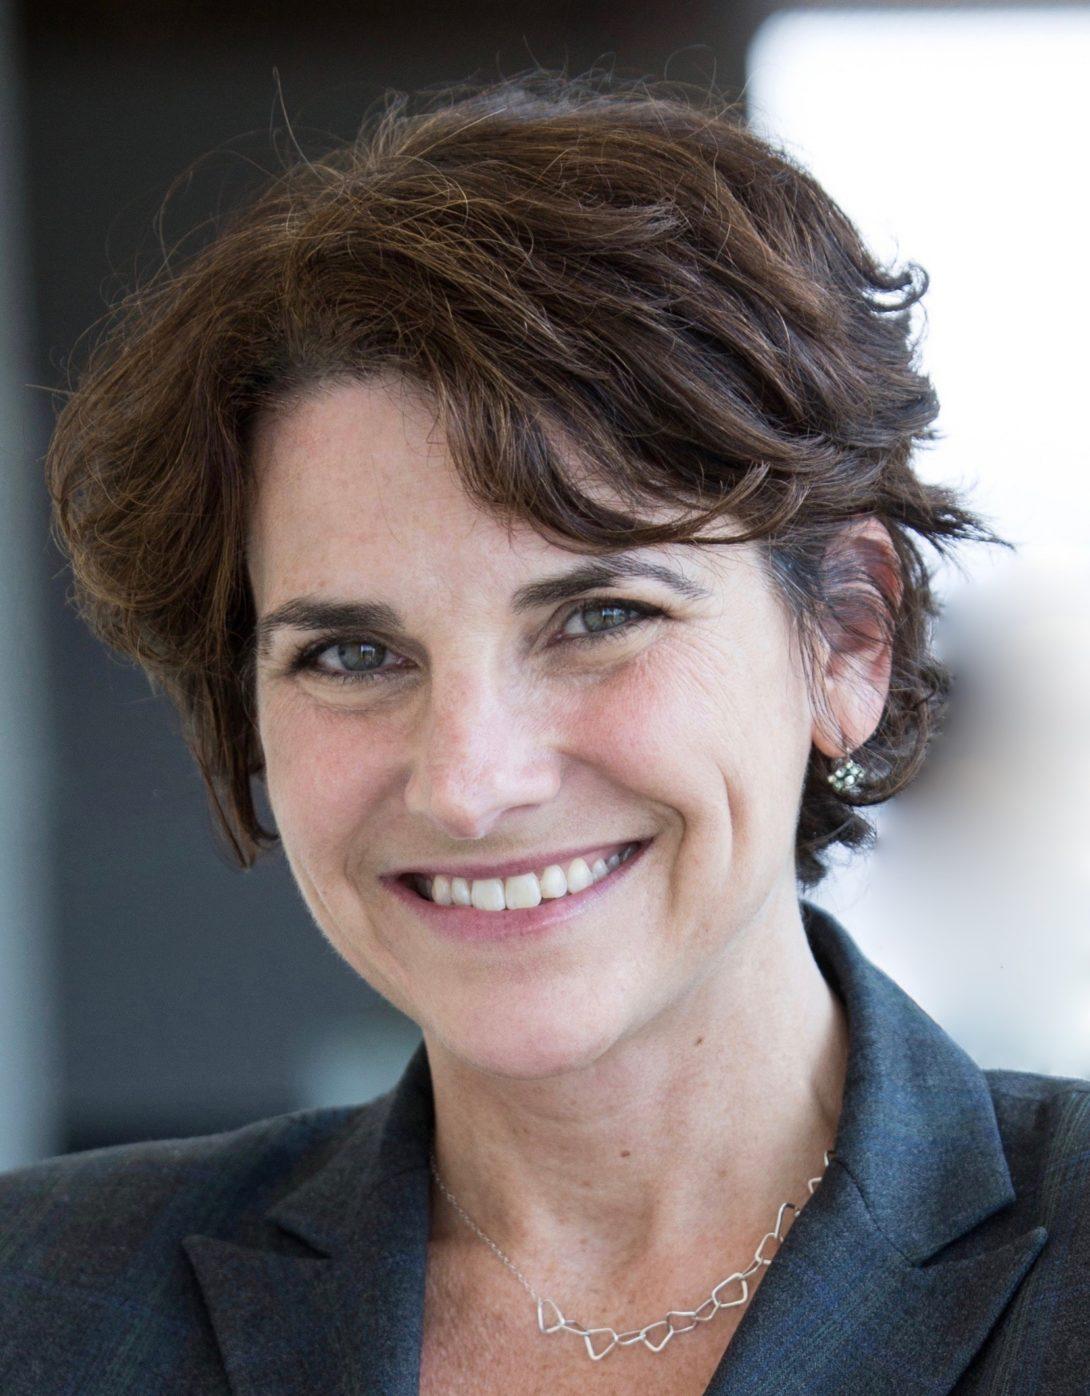 Dr. Michelle Arkin, Associate Professor, School of Pharmacy University of California, San Francisco